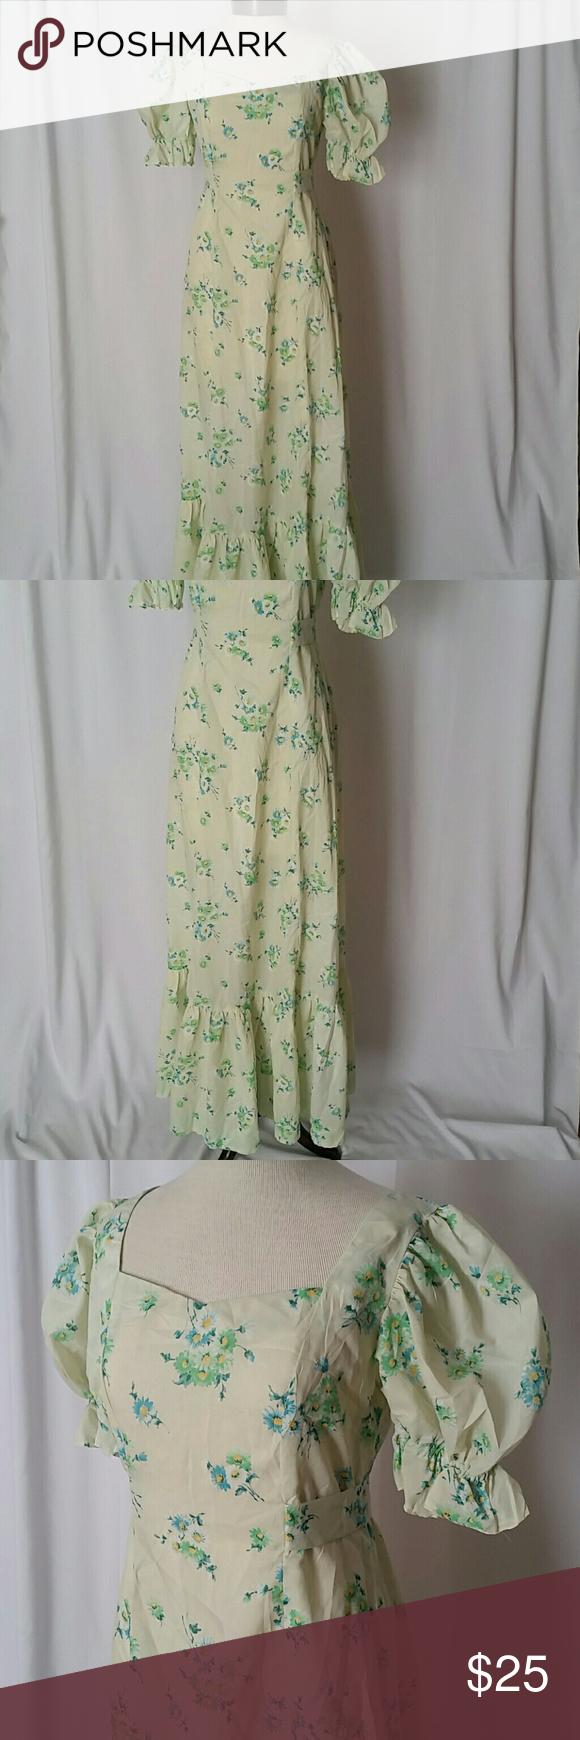 Handmade vintage s floral maxi dress floral maxi dress floral